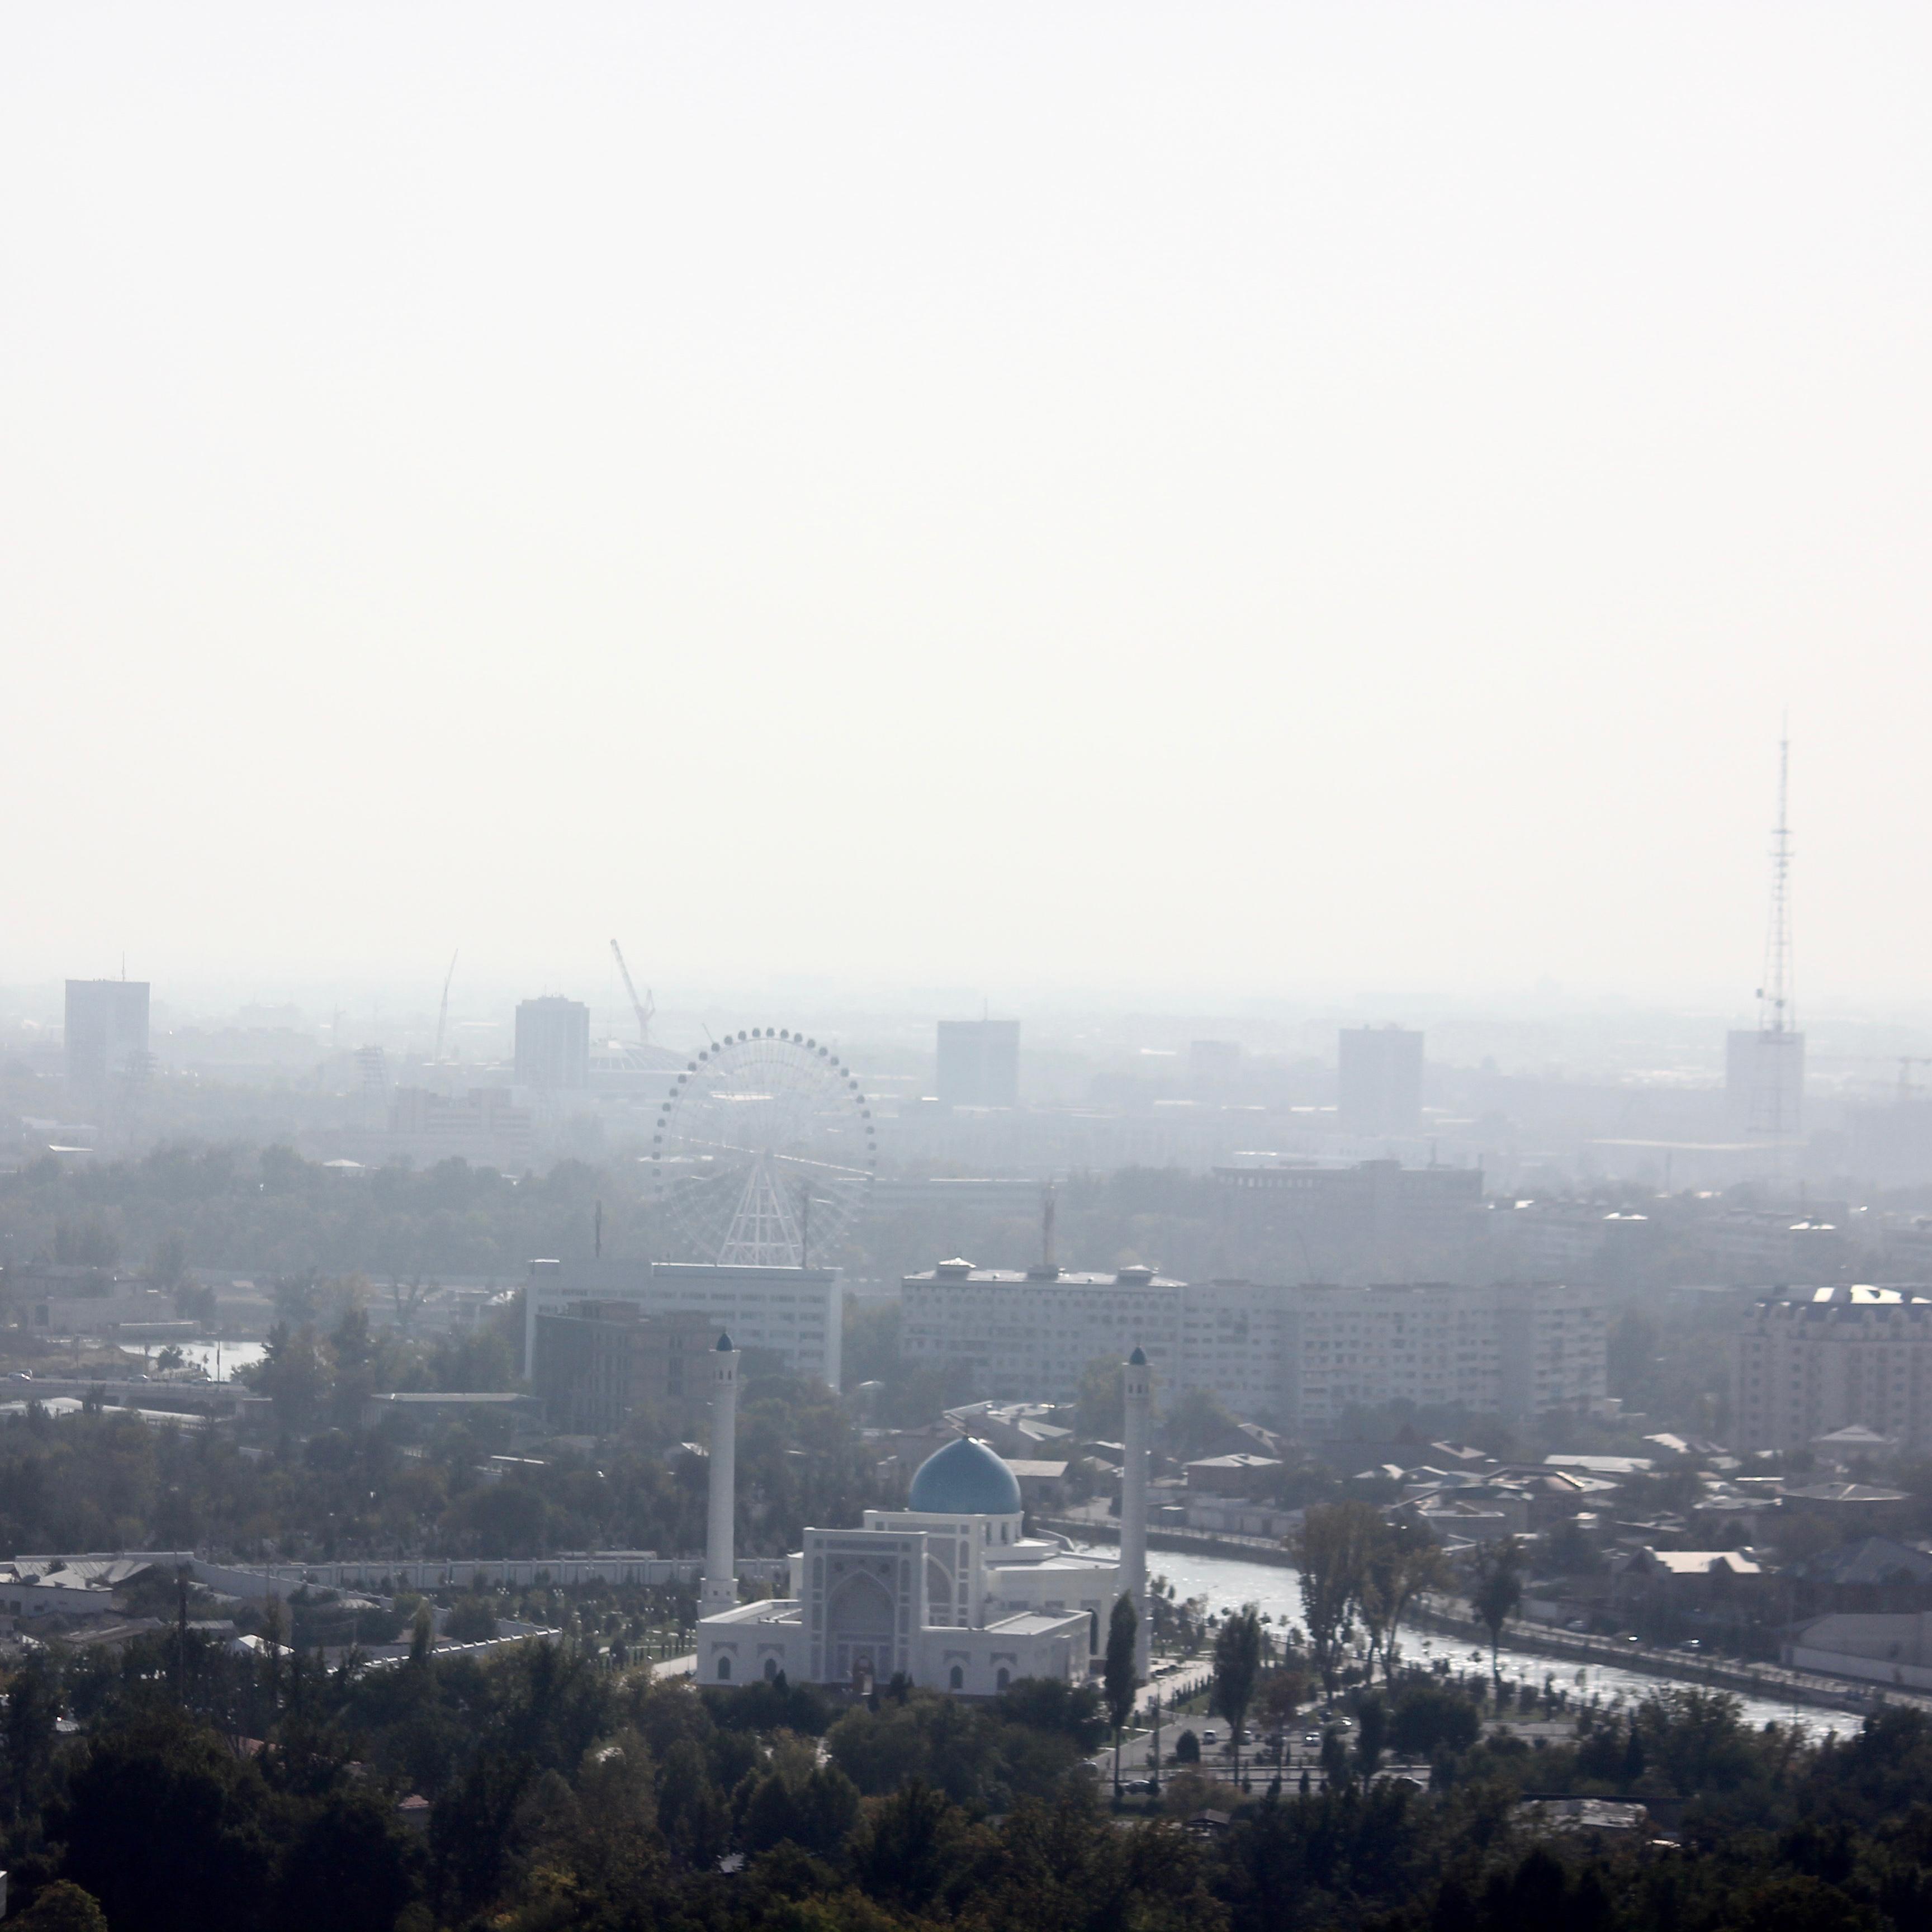 tashkent, uzbekistan - 2 (2)